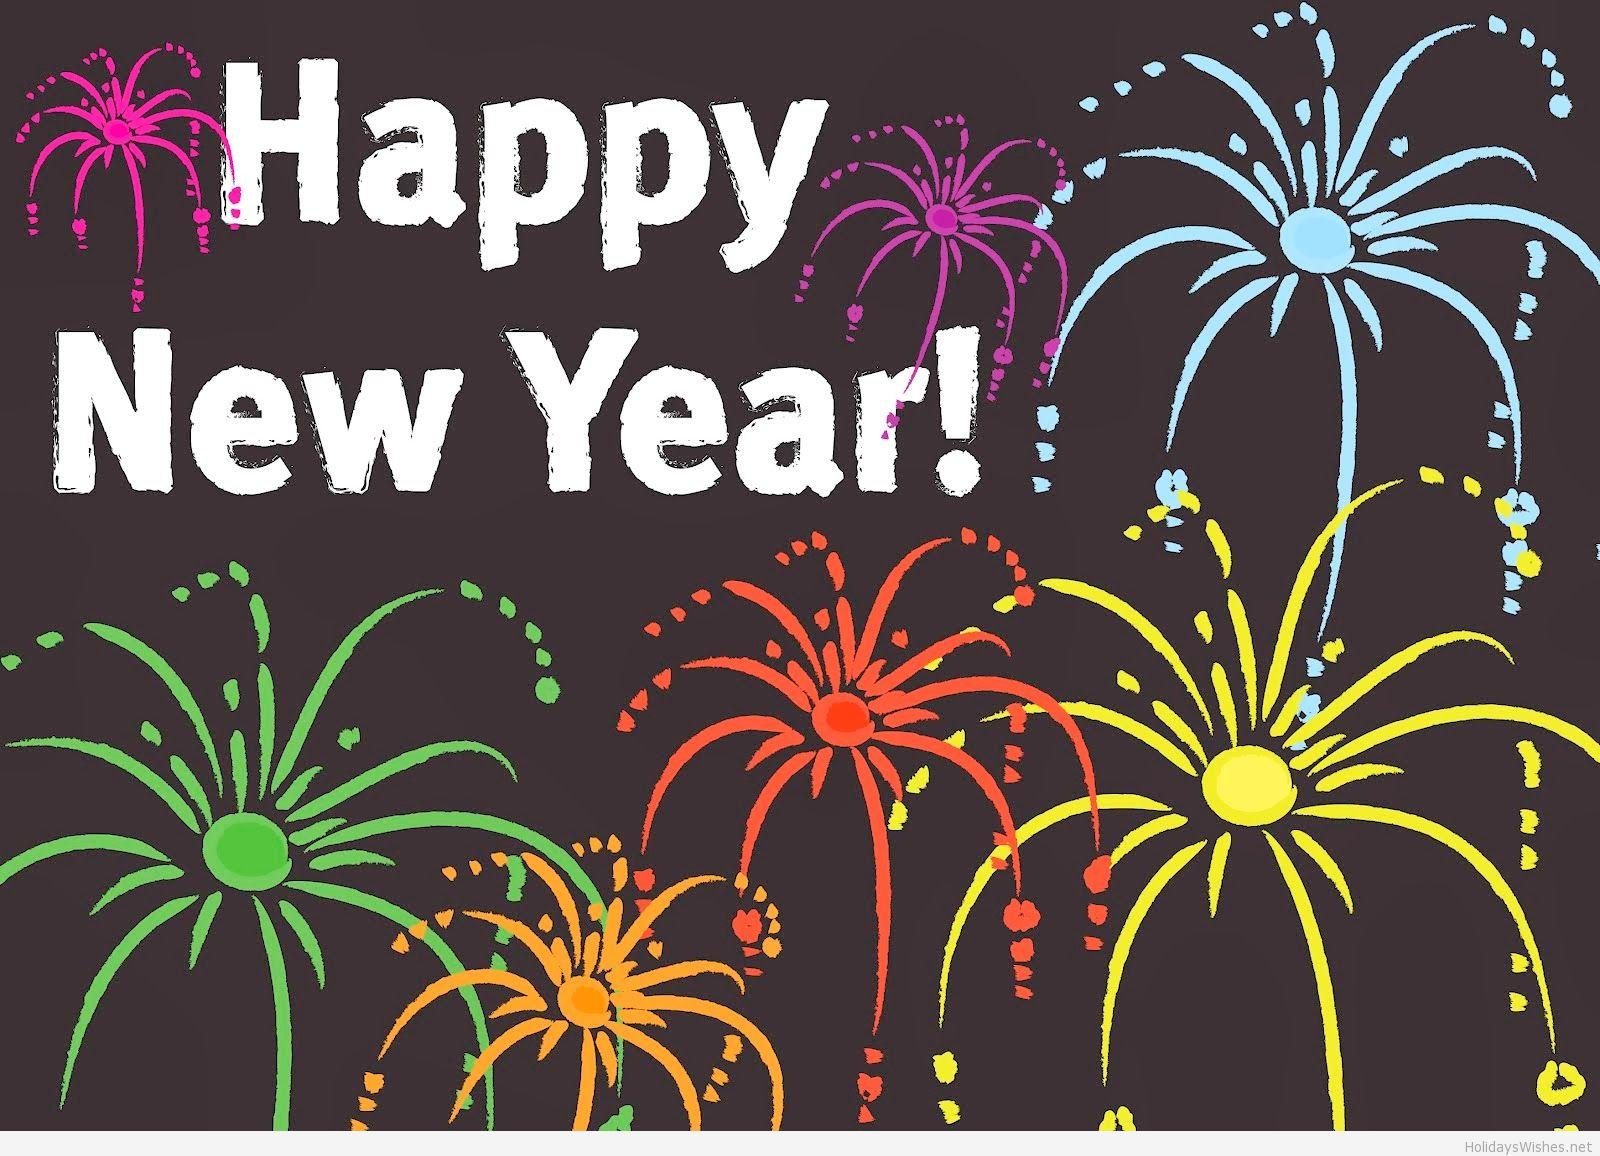 New year greetings wallpaper 2015 wallpapersafari happy new year 2015 greeting wallpaper 5860 wallpaper computer best 1600x1156 m4hsunfo